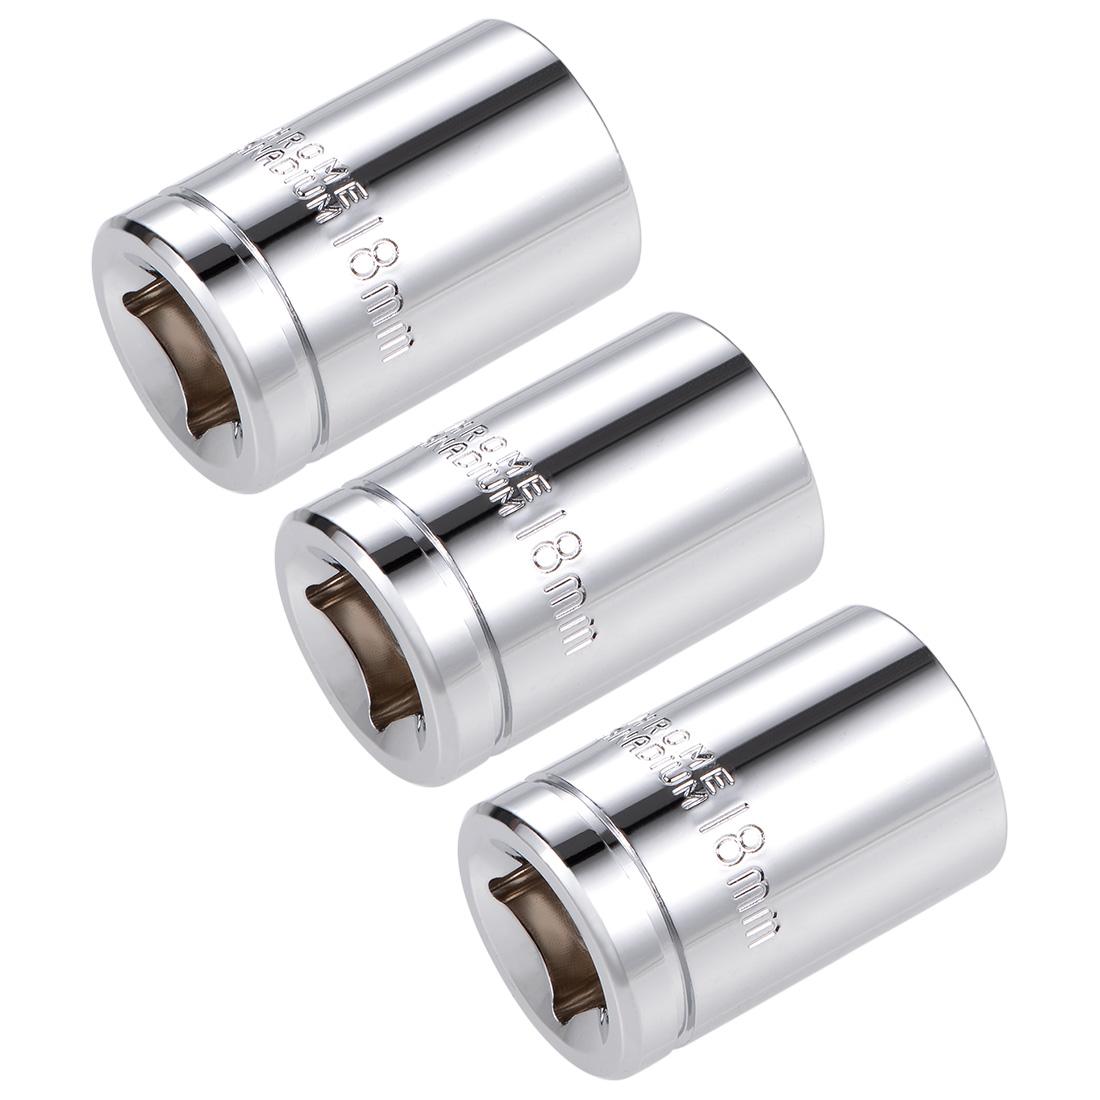 1/2-inch Drive E18 Universal Spline Socket Shallow 12 Point Cr-V Steel 3 pcs